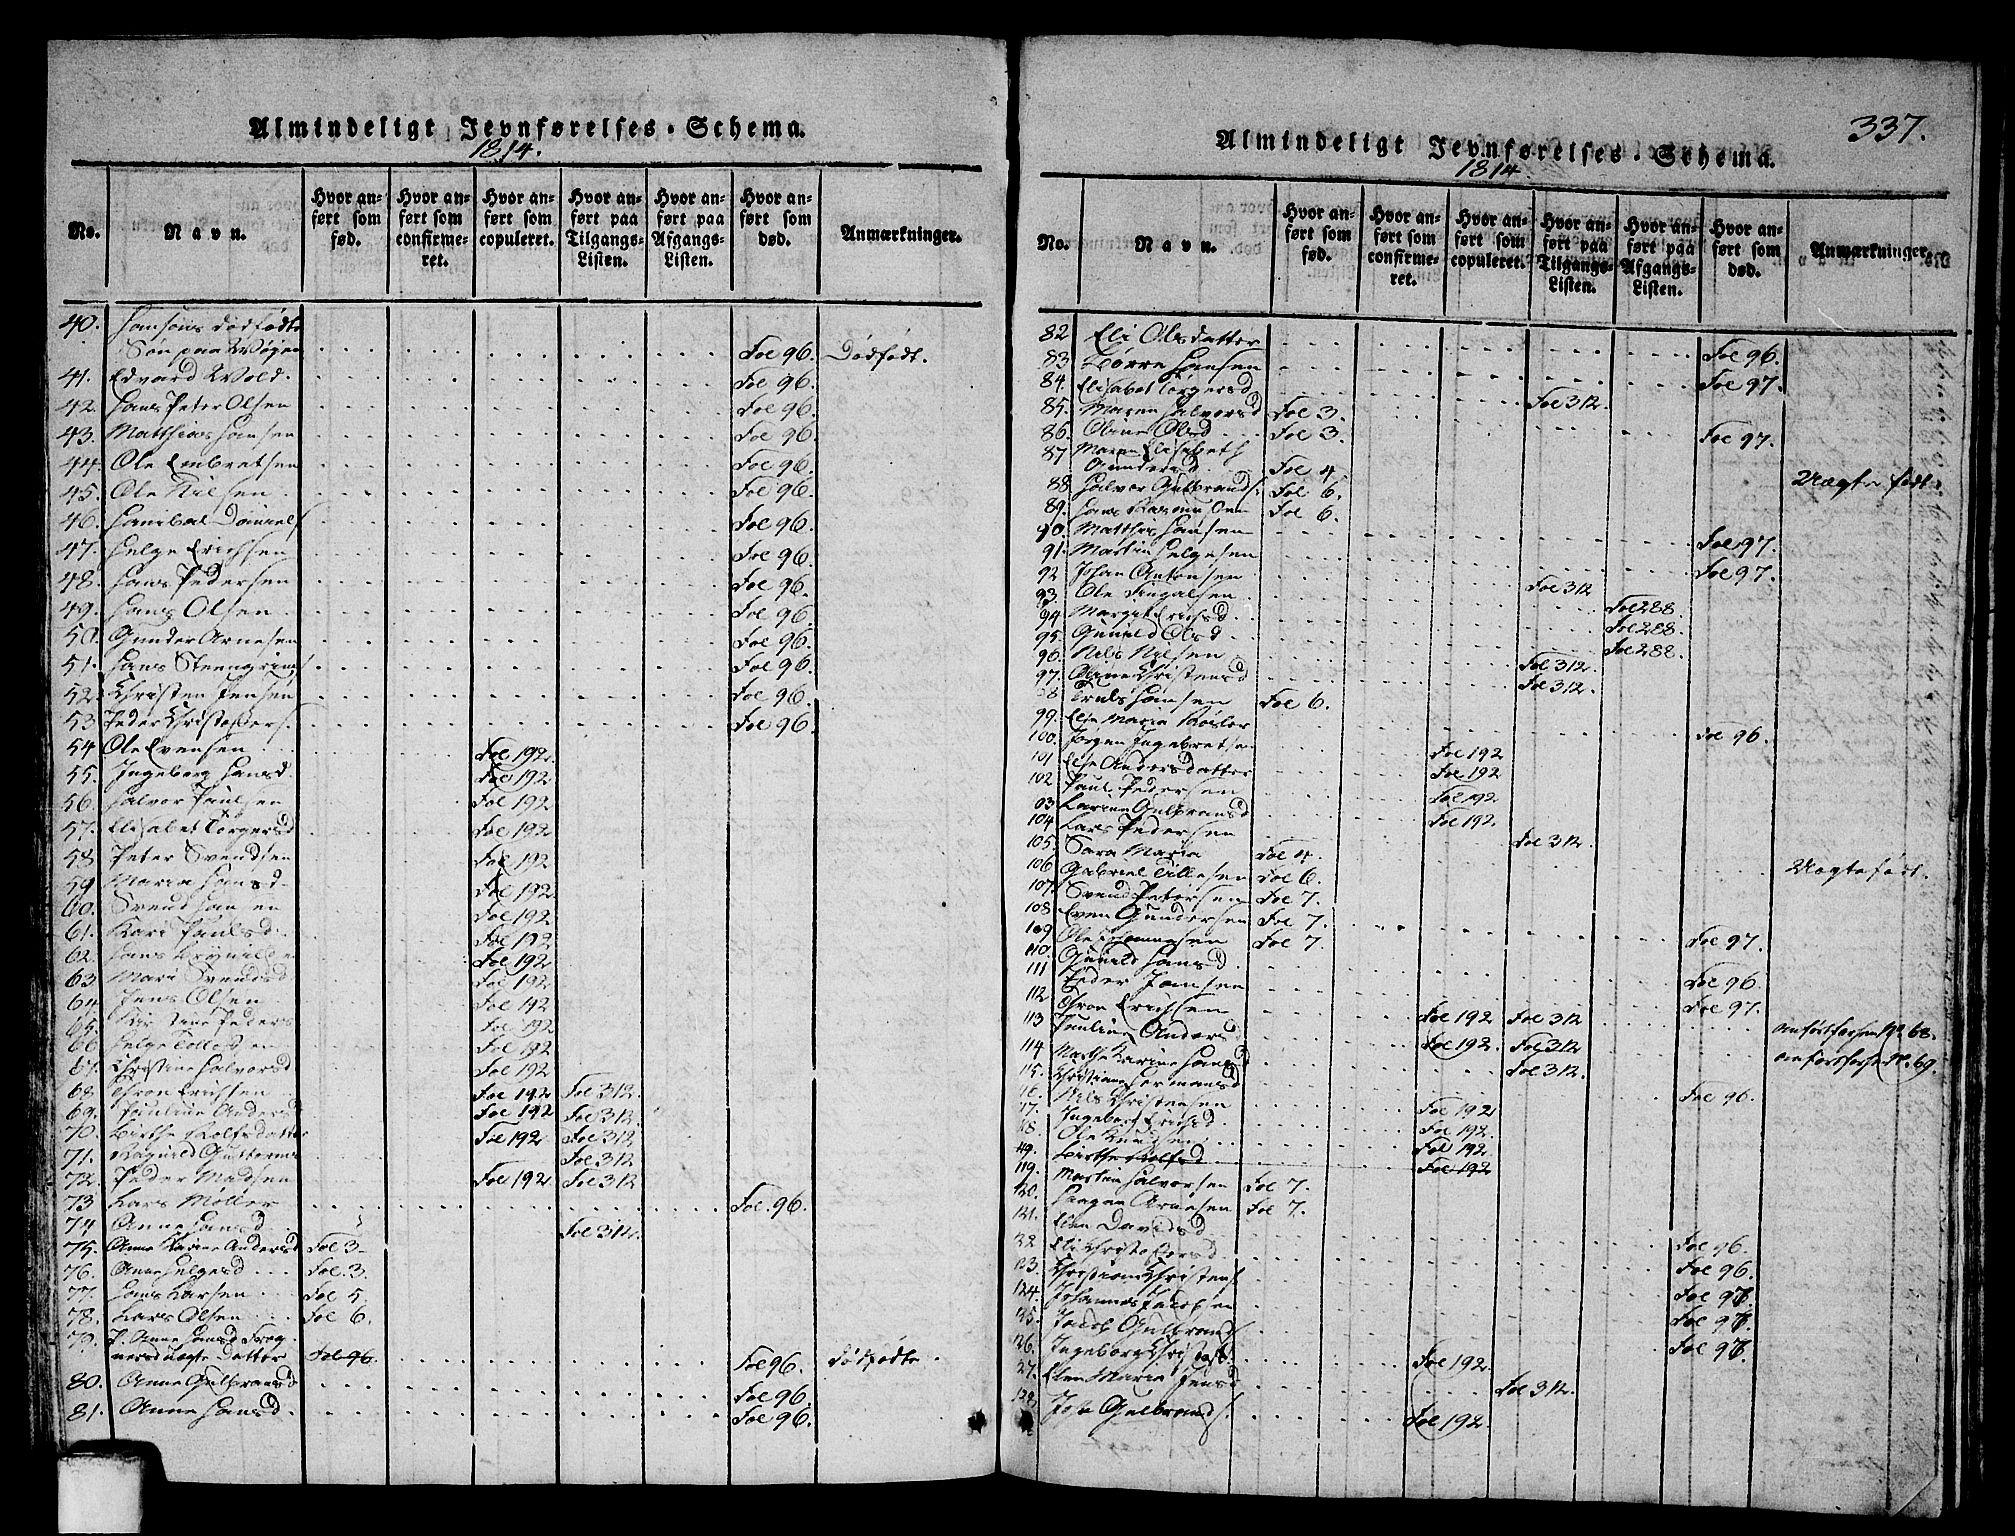 SAO, Asker prestekontor Kirkebøker, G/Ga/L0001: Klokkerbok nr. I 1, 1814-1830, s. 337